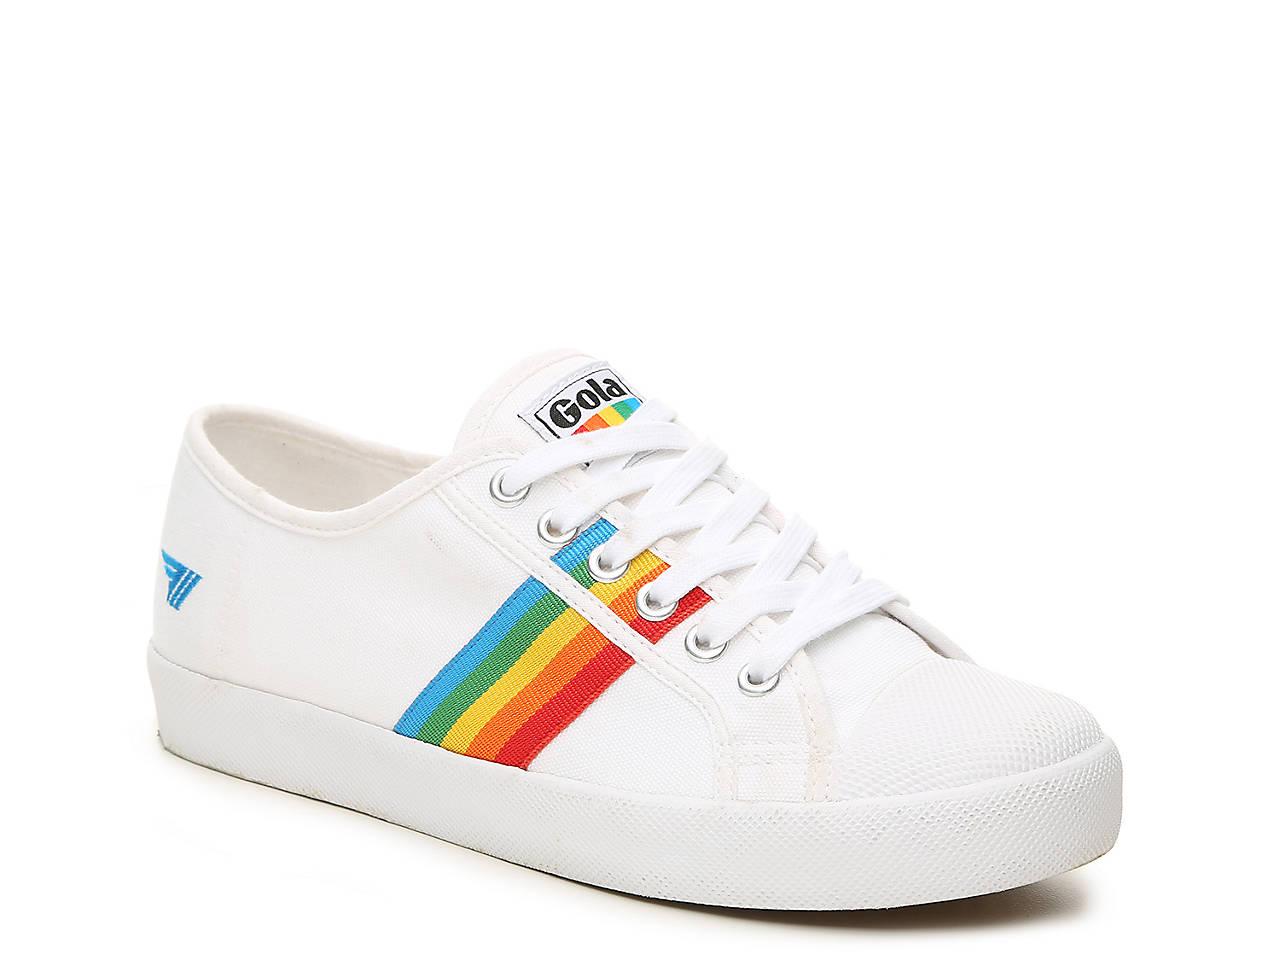 f431a930fa7f3 Gola Coaster Optic Sneaker - Women s Women s Shoes